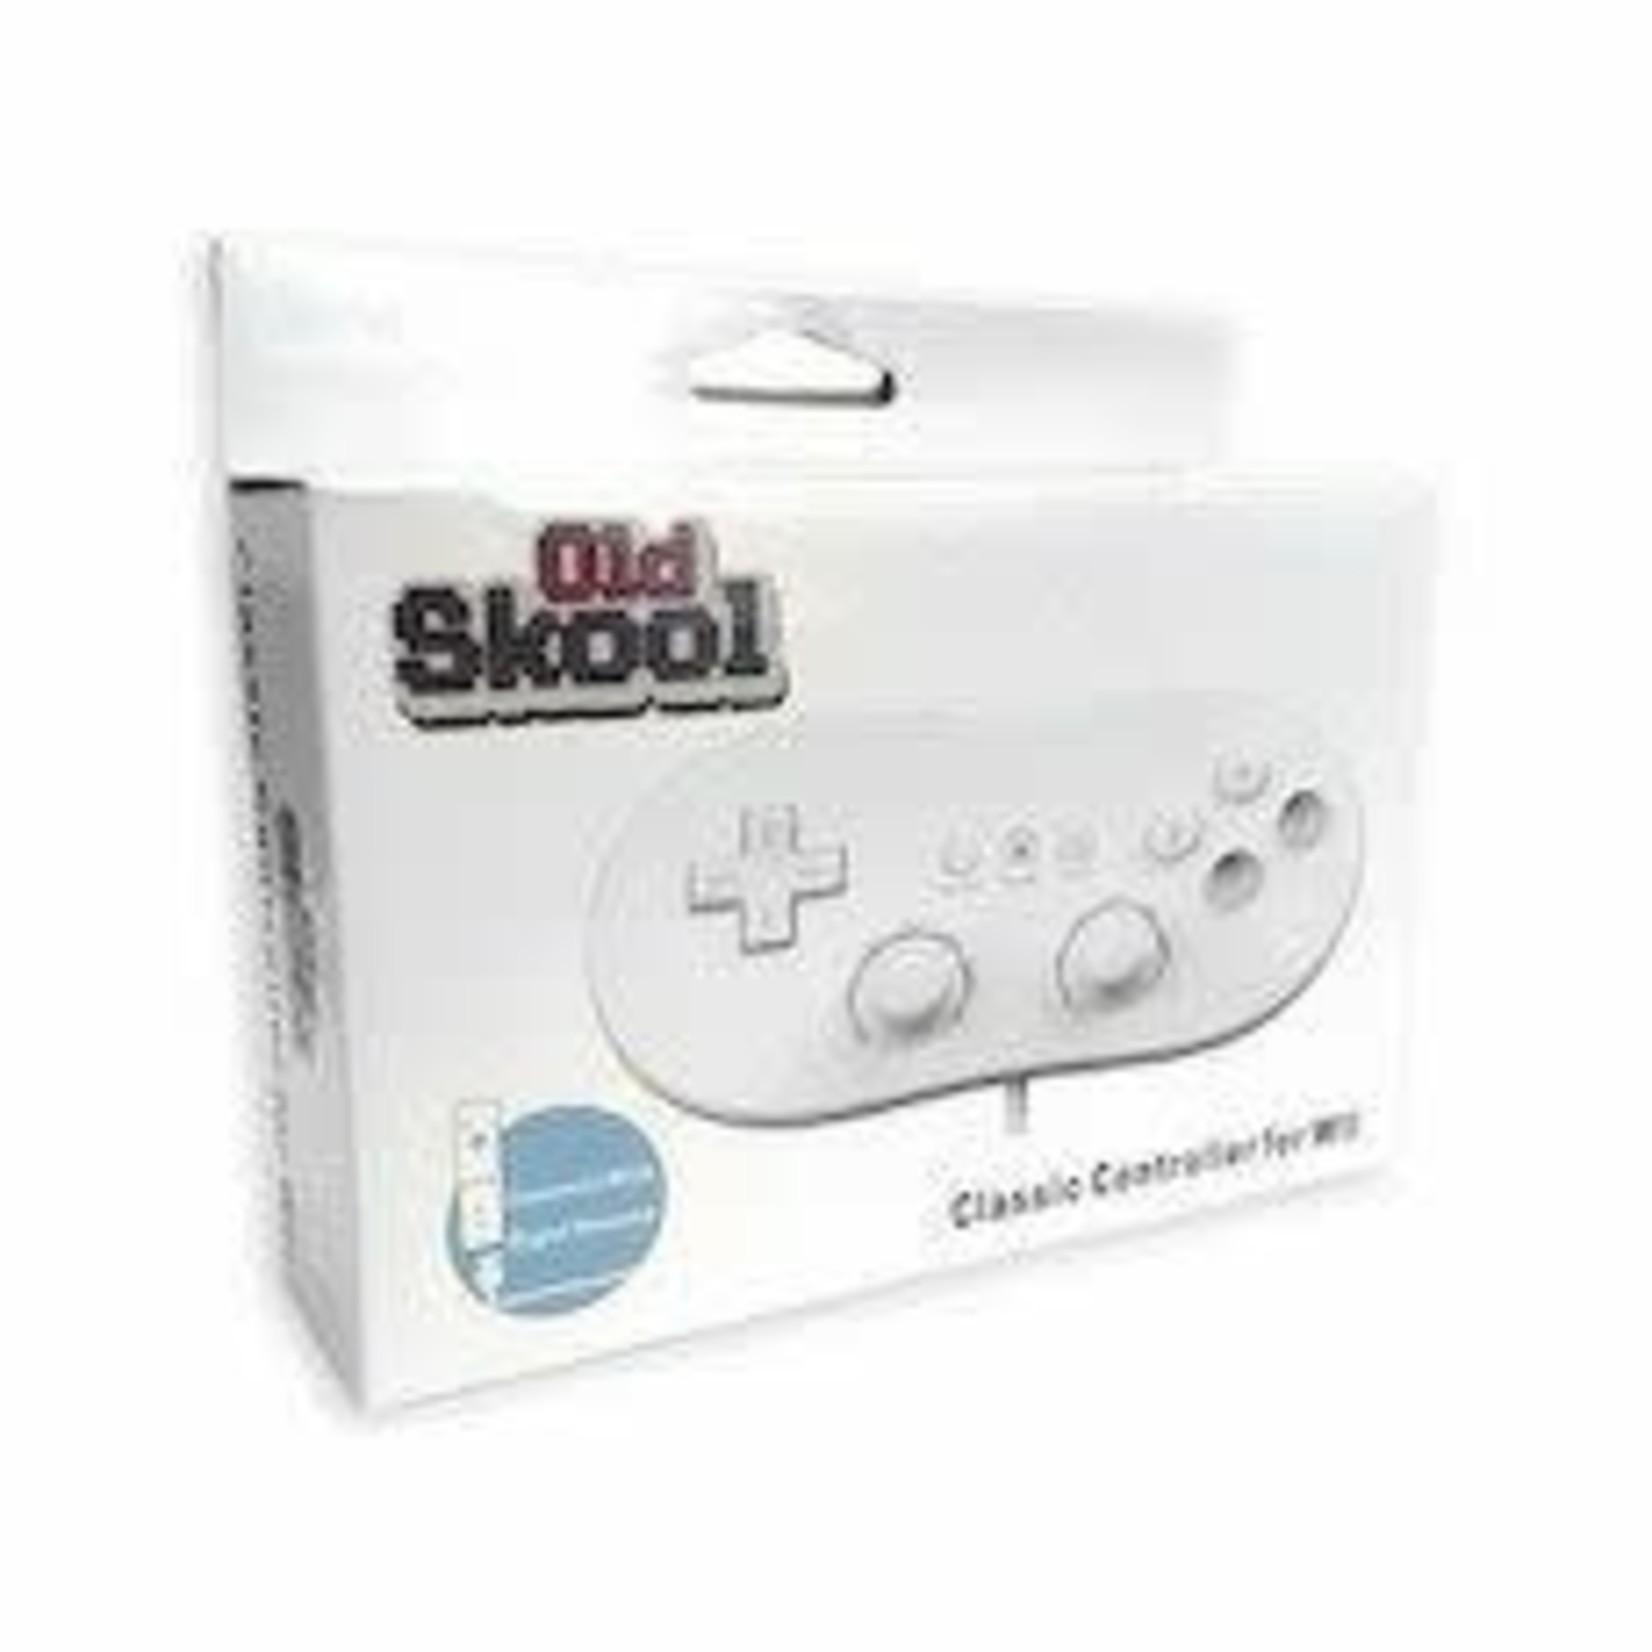 Old skool Wii classic controller